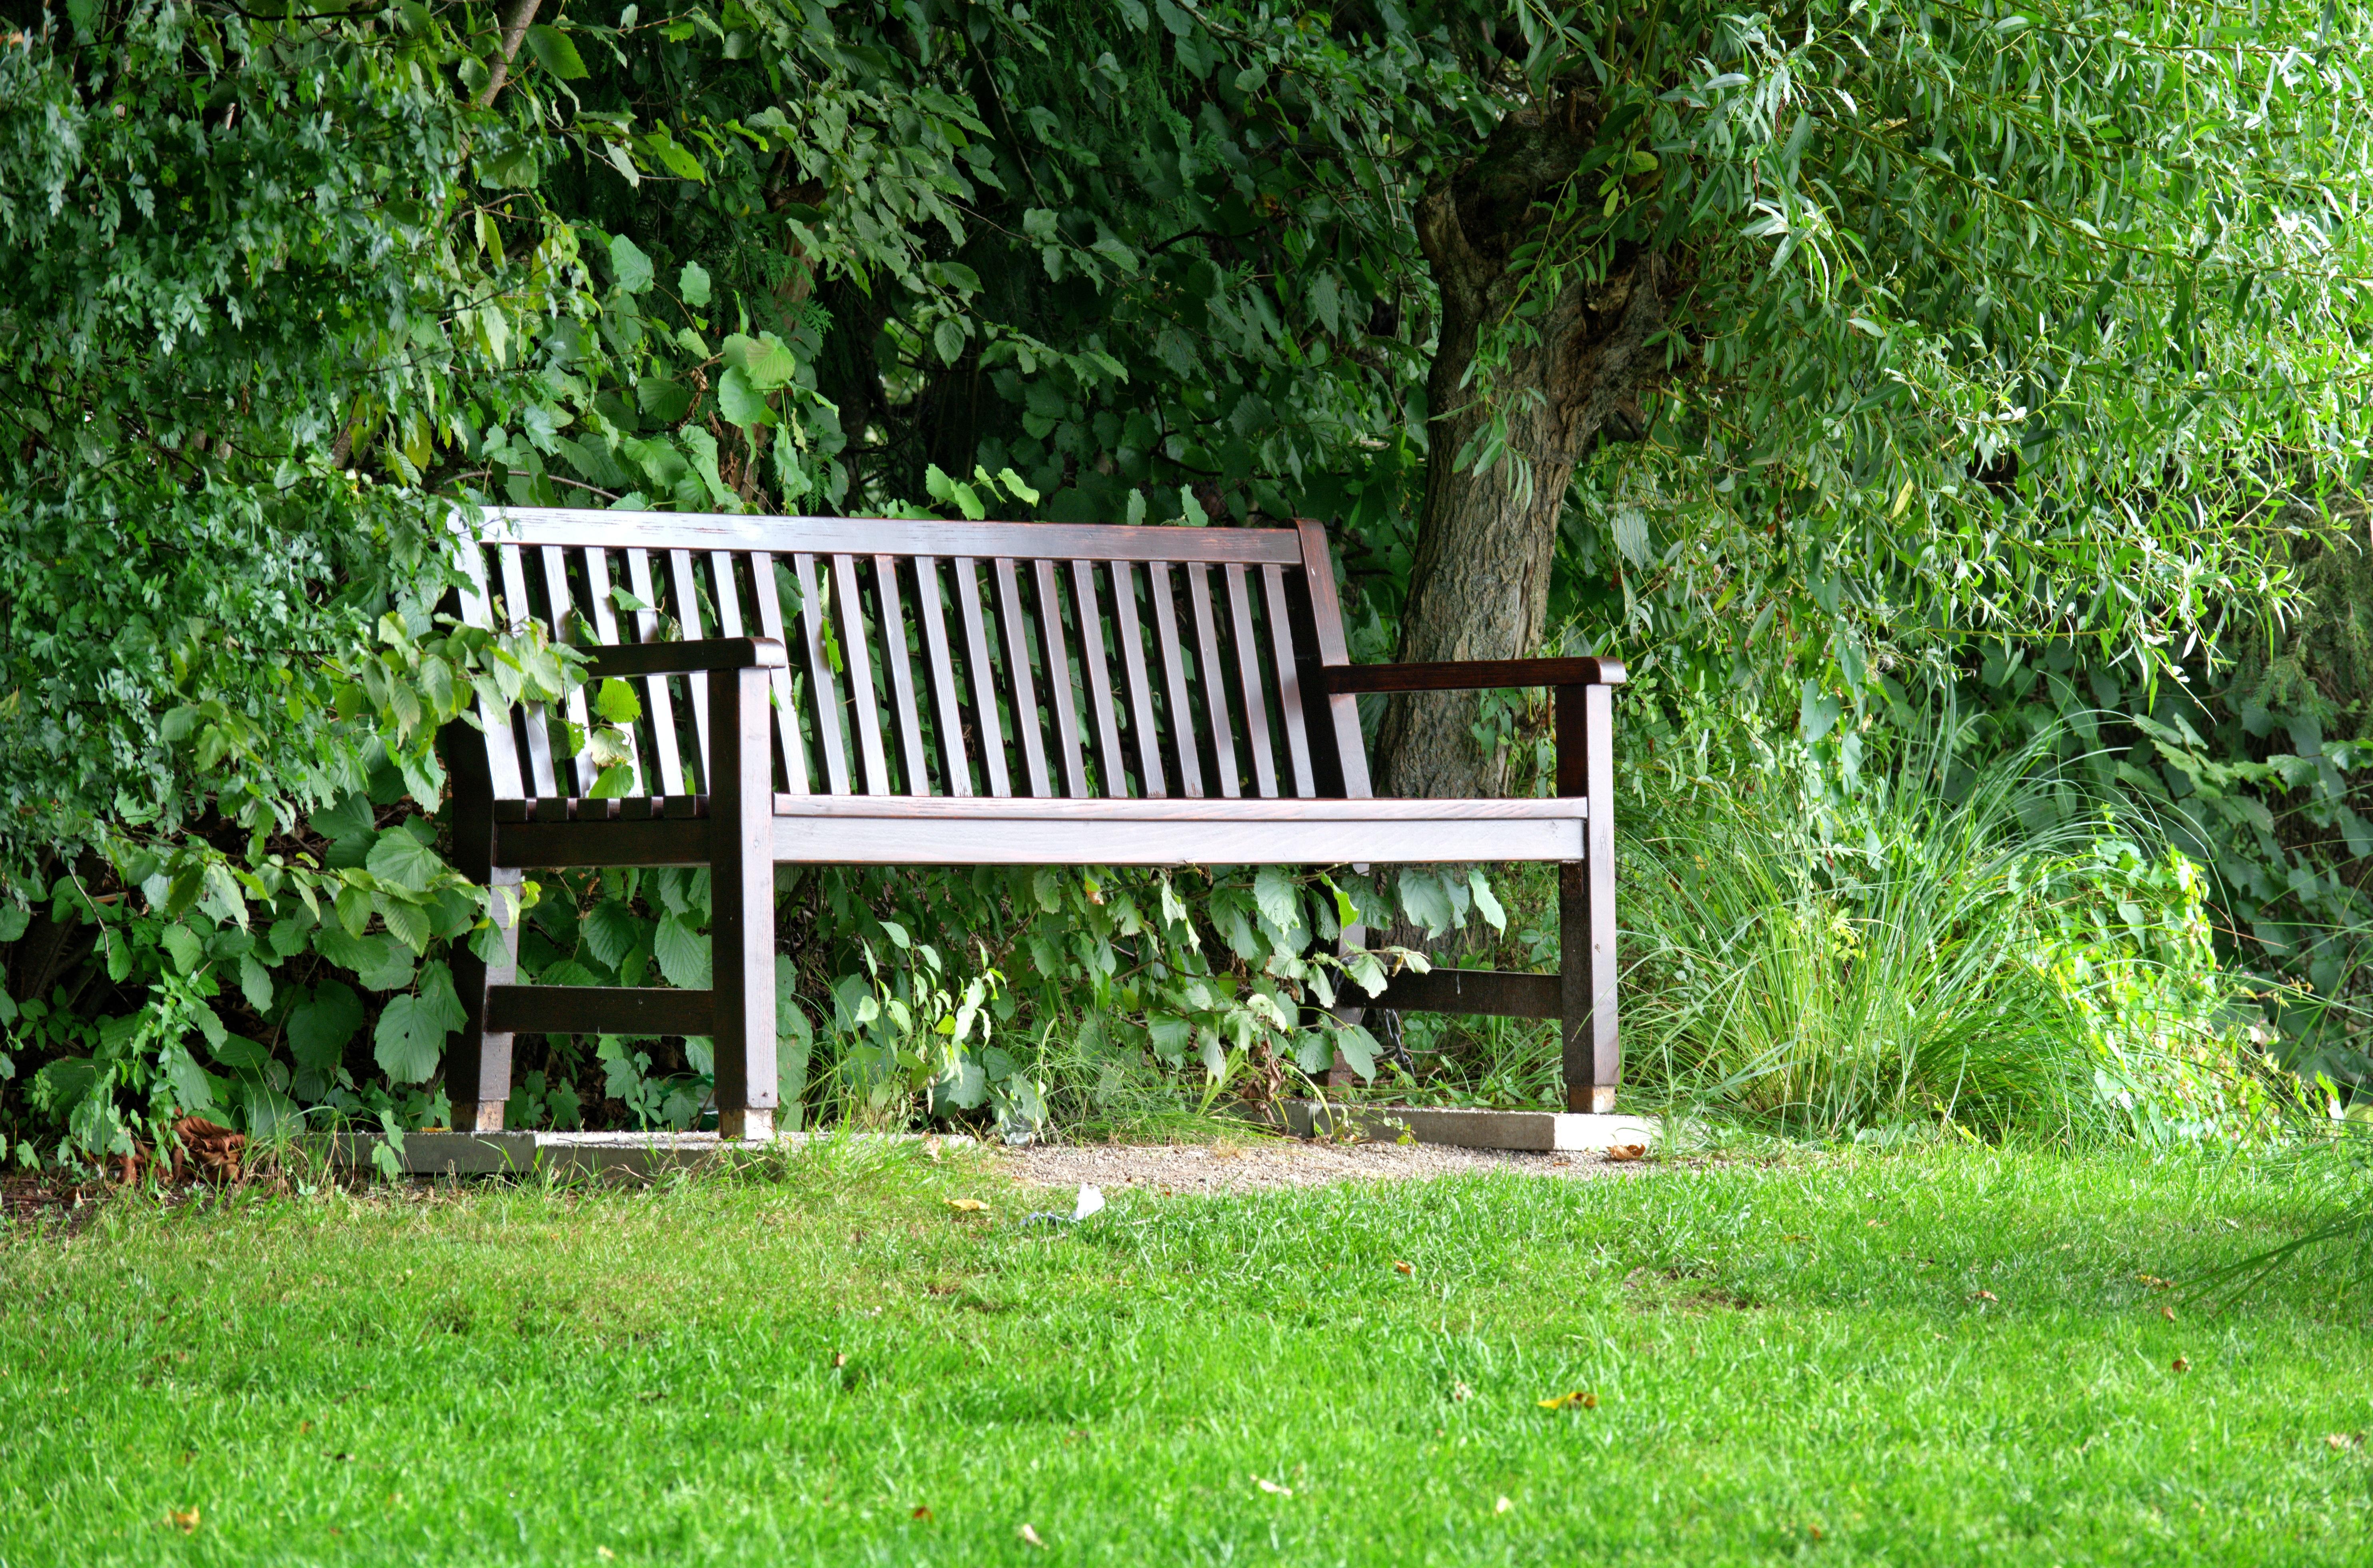 Fotos gratis : naturaleza, bosque, césped, banco, asiento, idílico ...